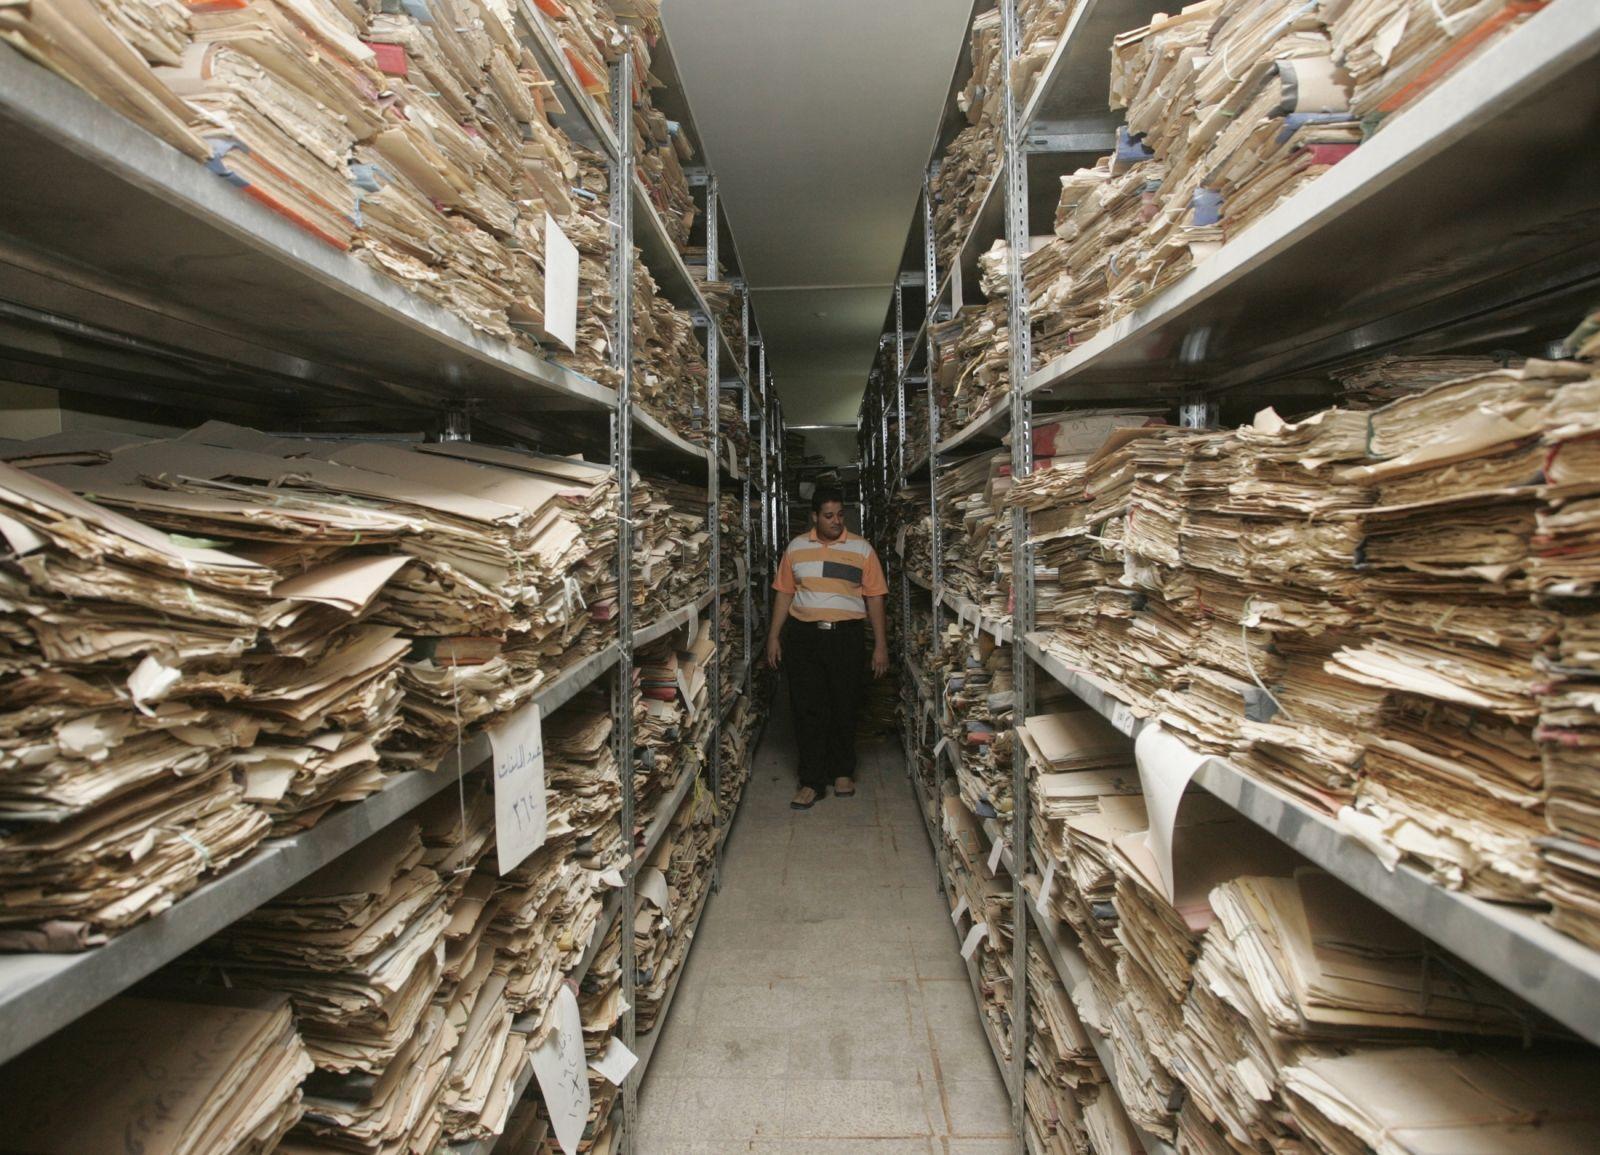 Iraq Library Digitized